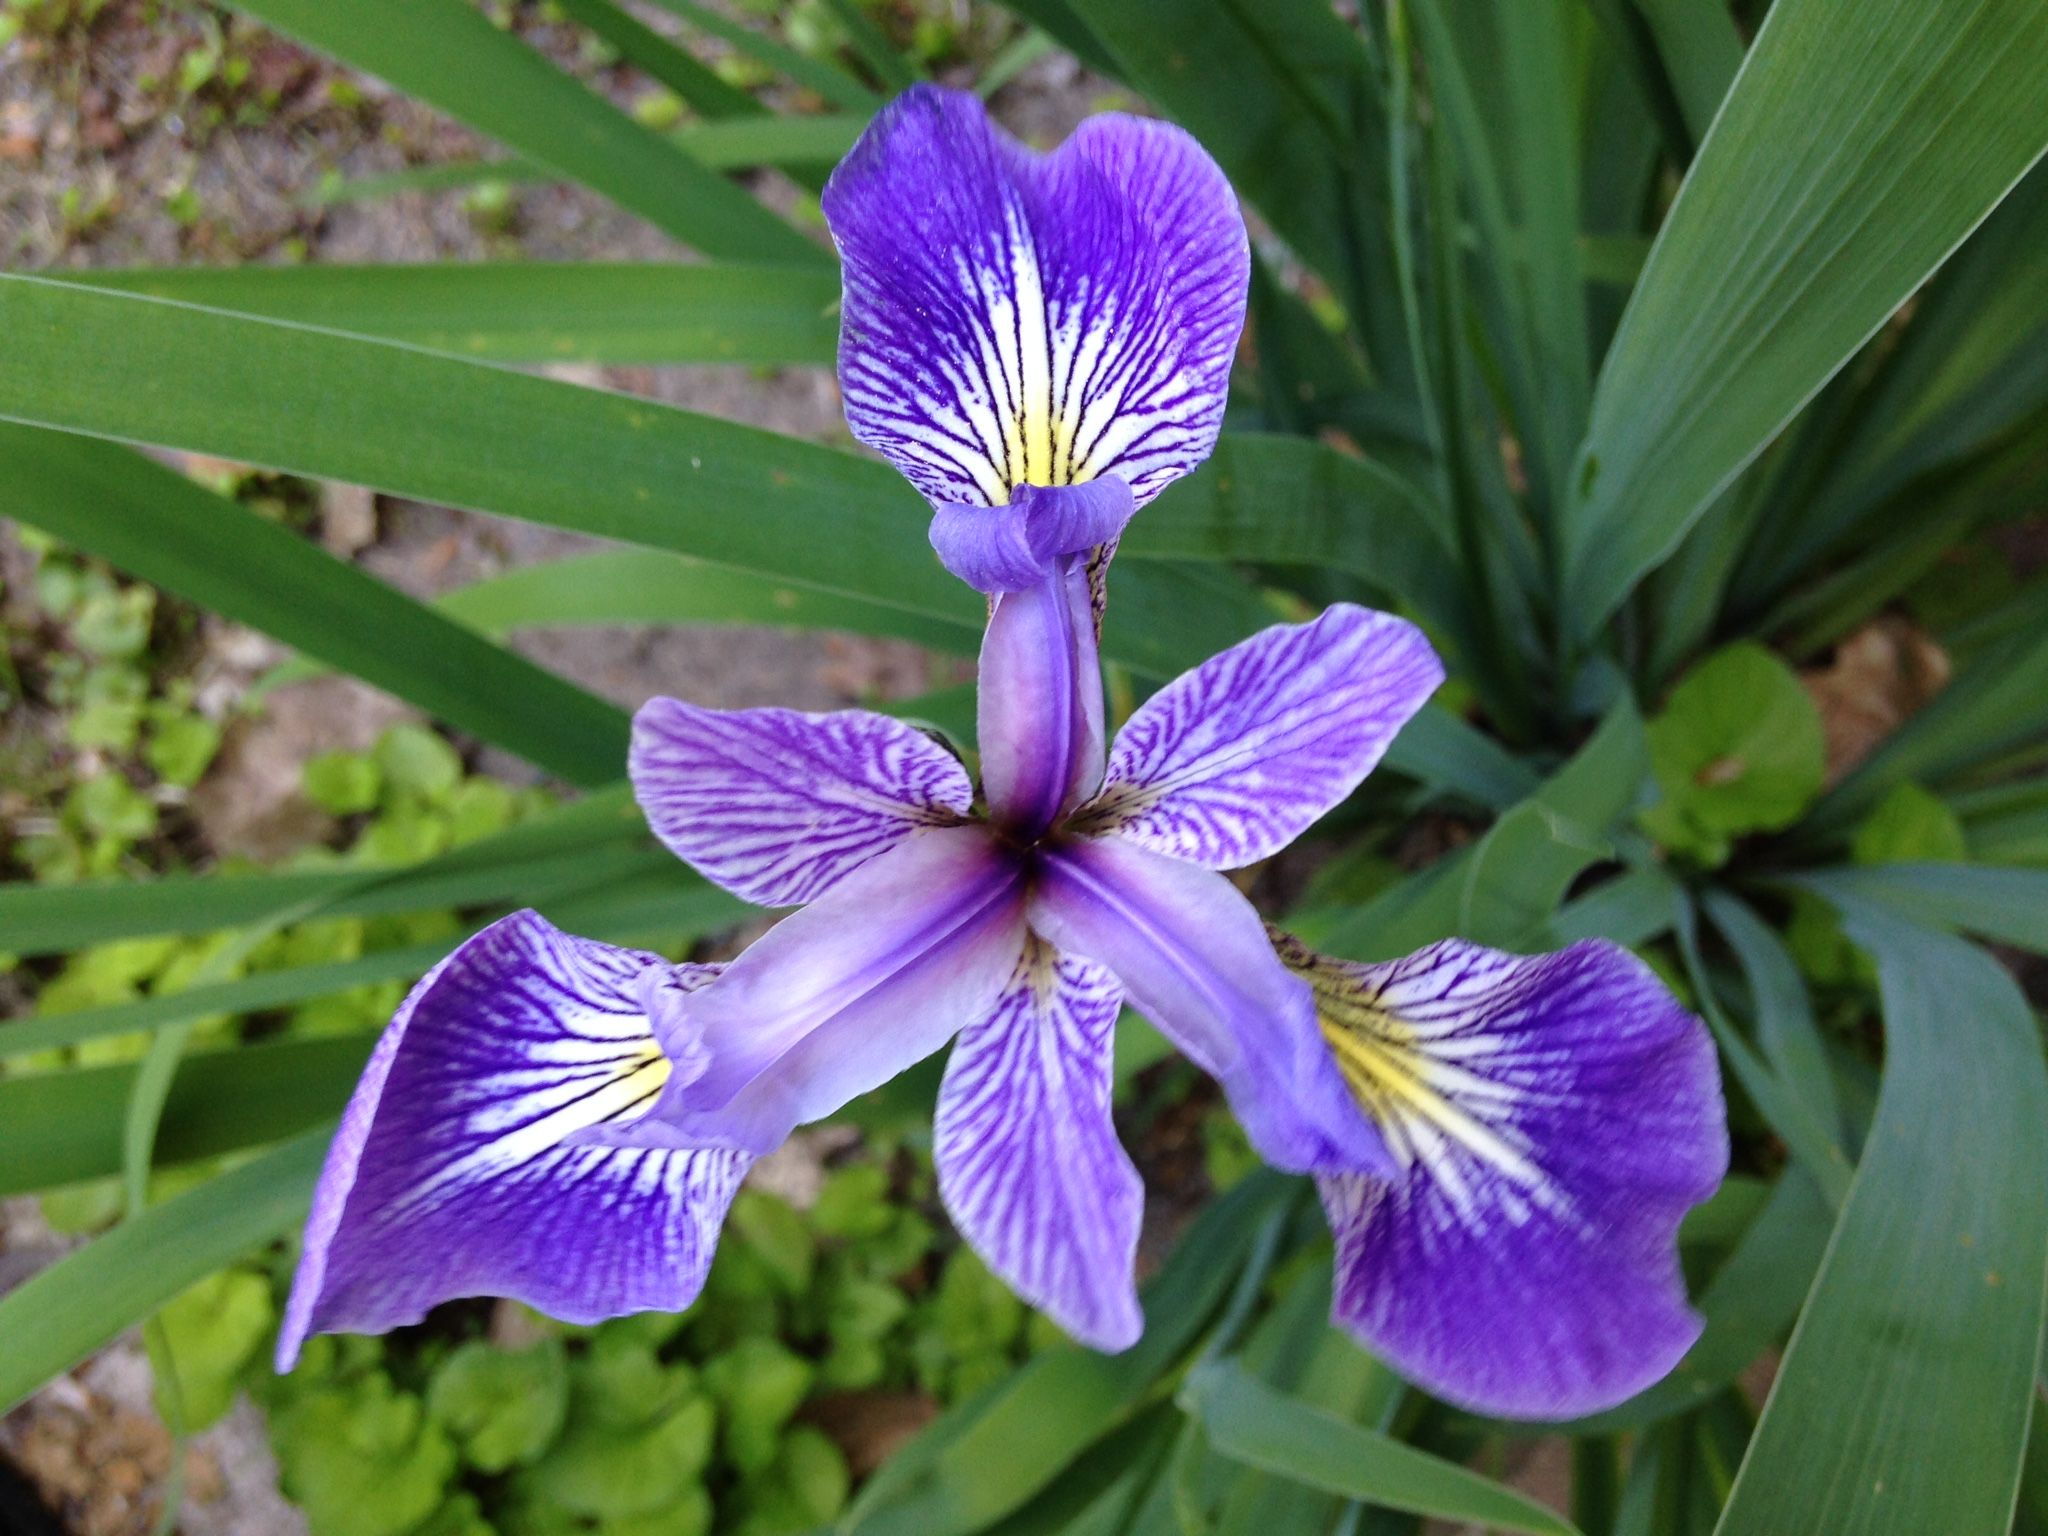 The Iris is February's birthday flower. It symbolizes